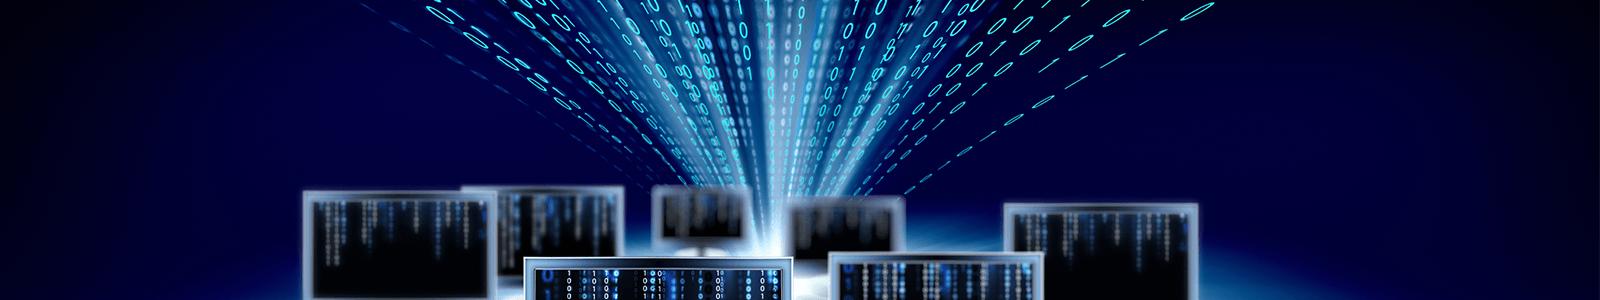 Vernon Technology Solutions - Desktop Computer Rental